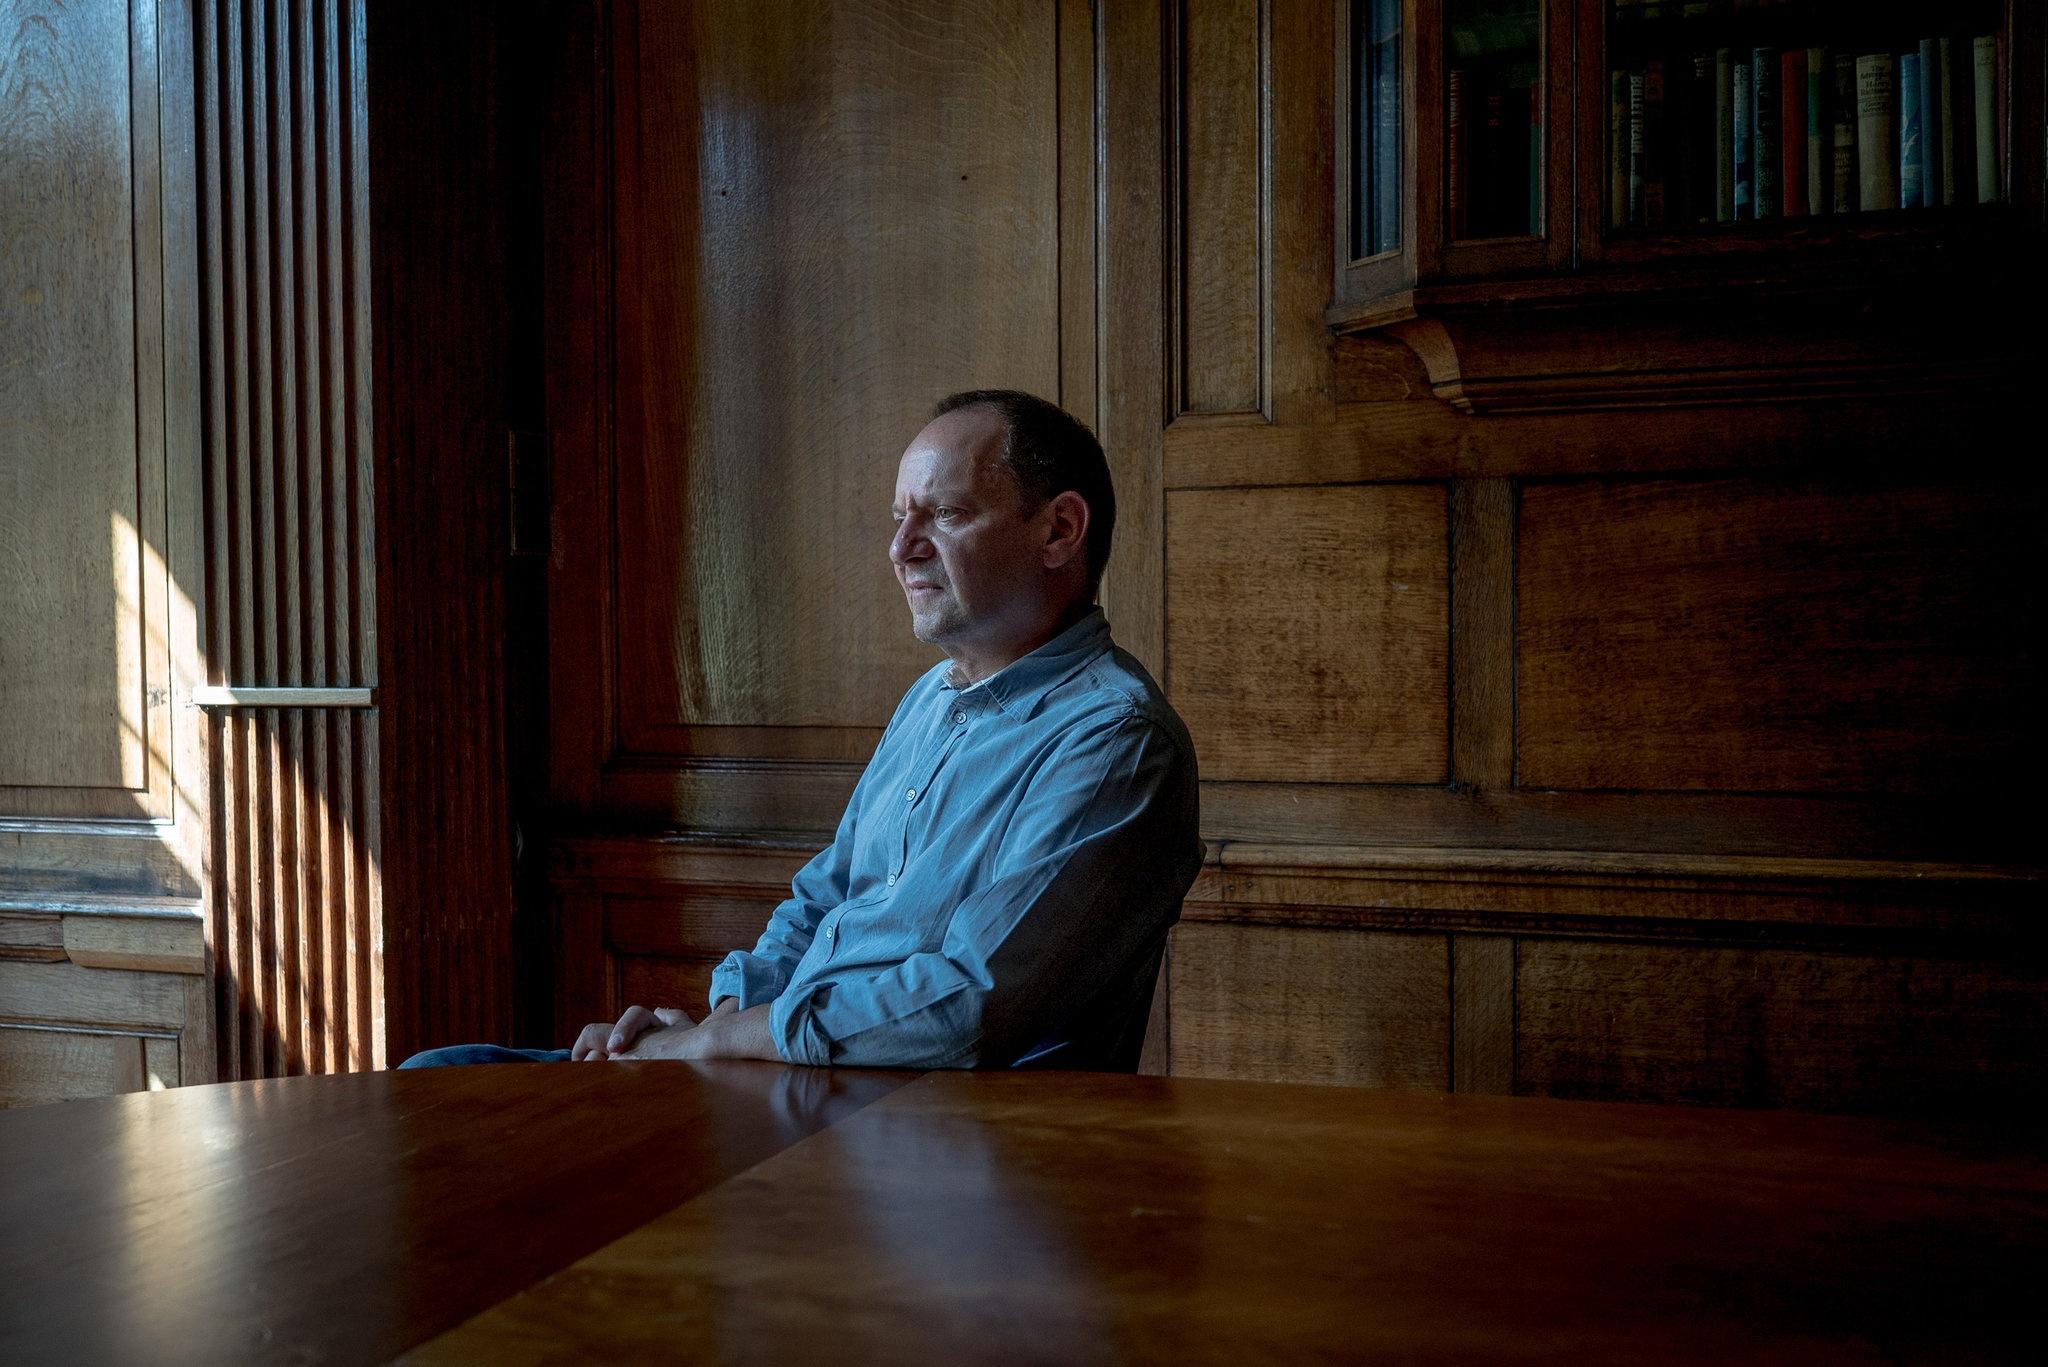 Філіпп Сандс (фото: Andrew Testa, The New York Times)